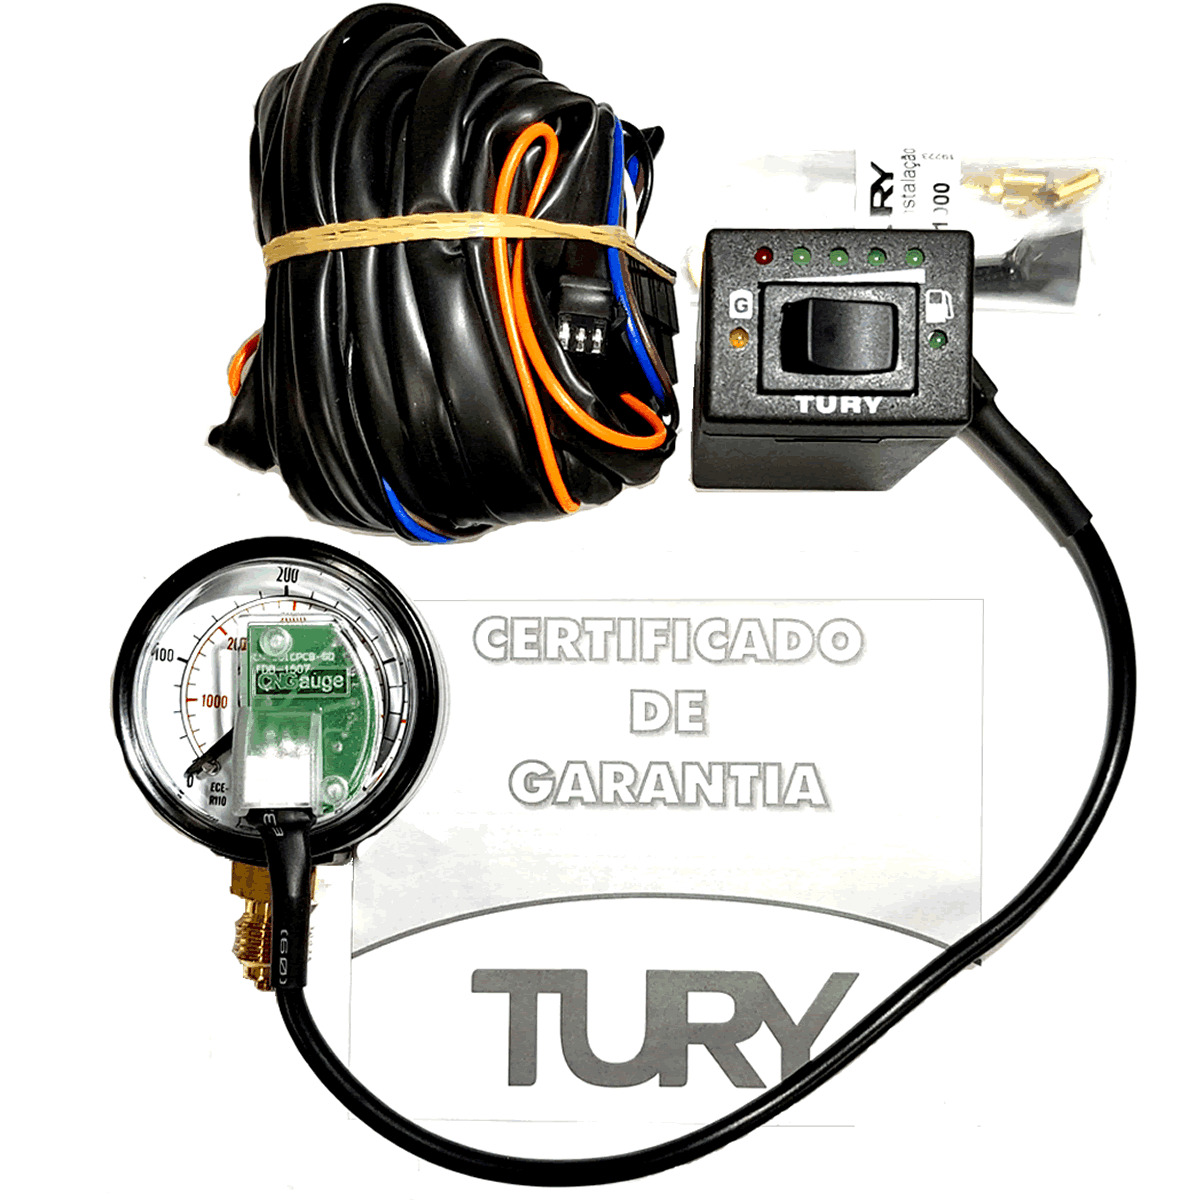 Kit Elétrico TURY GAS T1000 A Chave Manômetro e Chicote